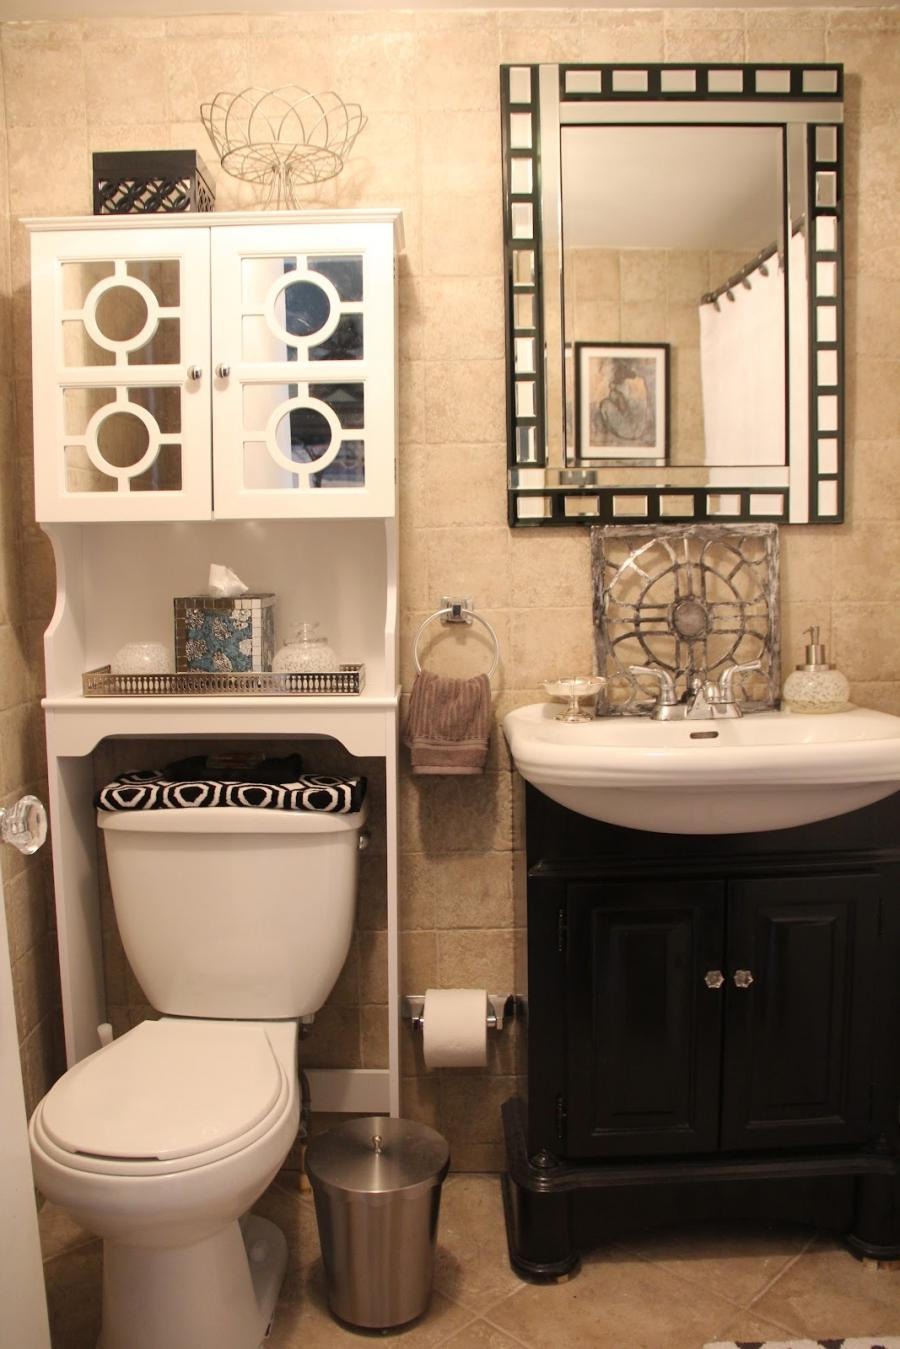 Black and beige bathroom